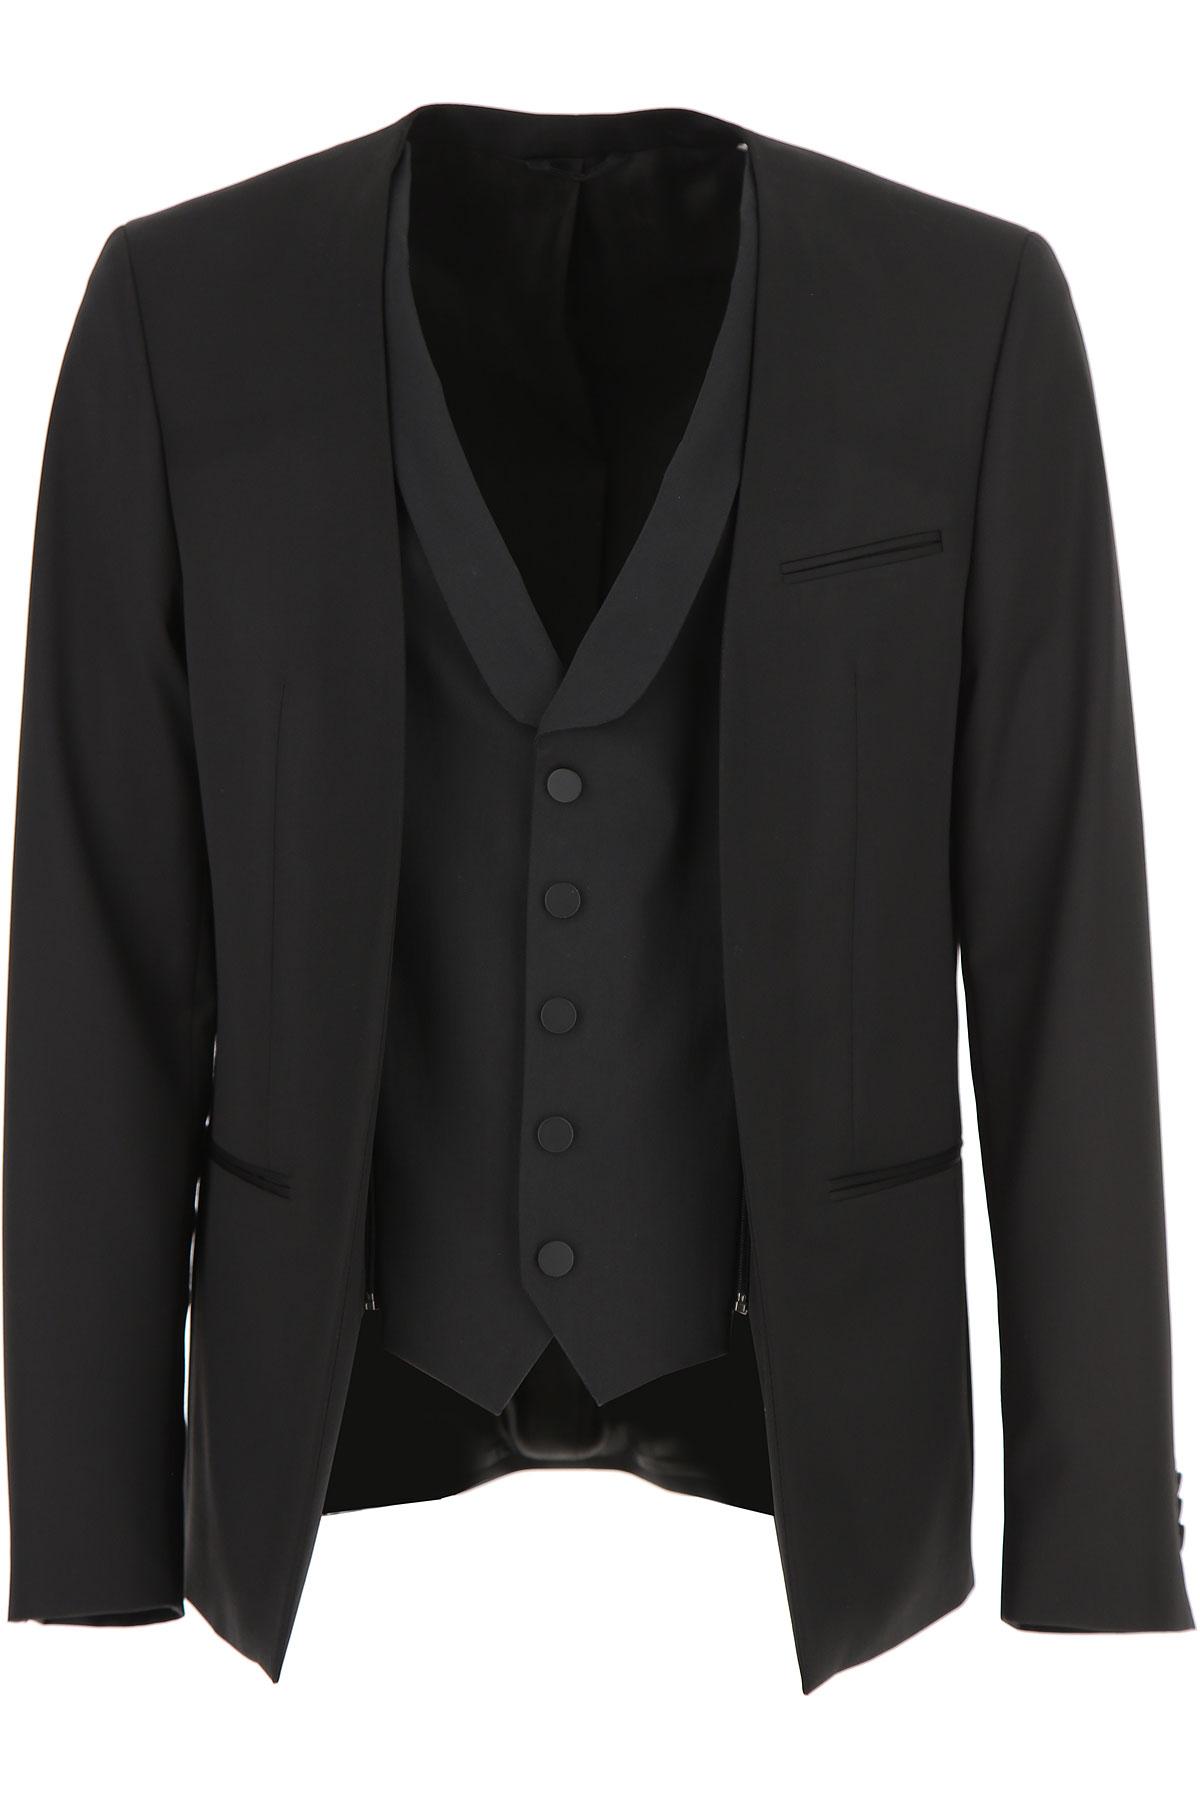 Image of Karl Lagerfeld Blazer for Men, Sport Coat On Sale, Black, Cotton, 2017, L M XXL